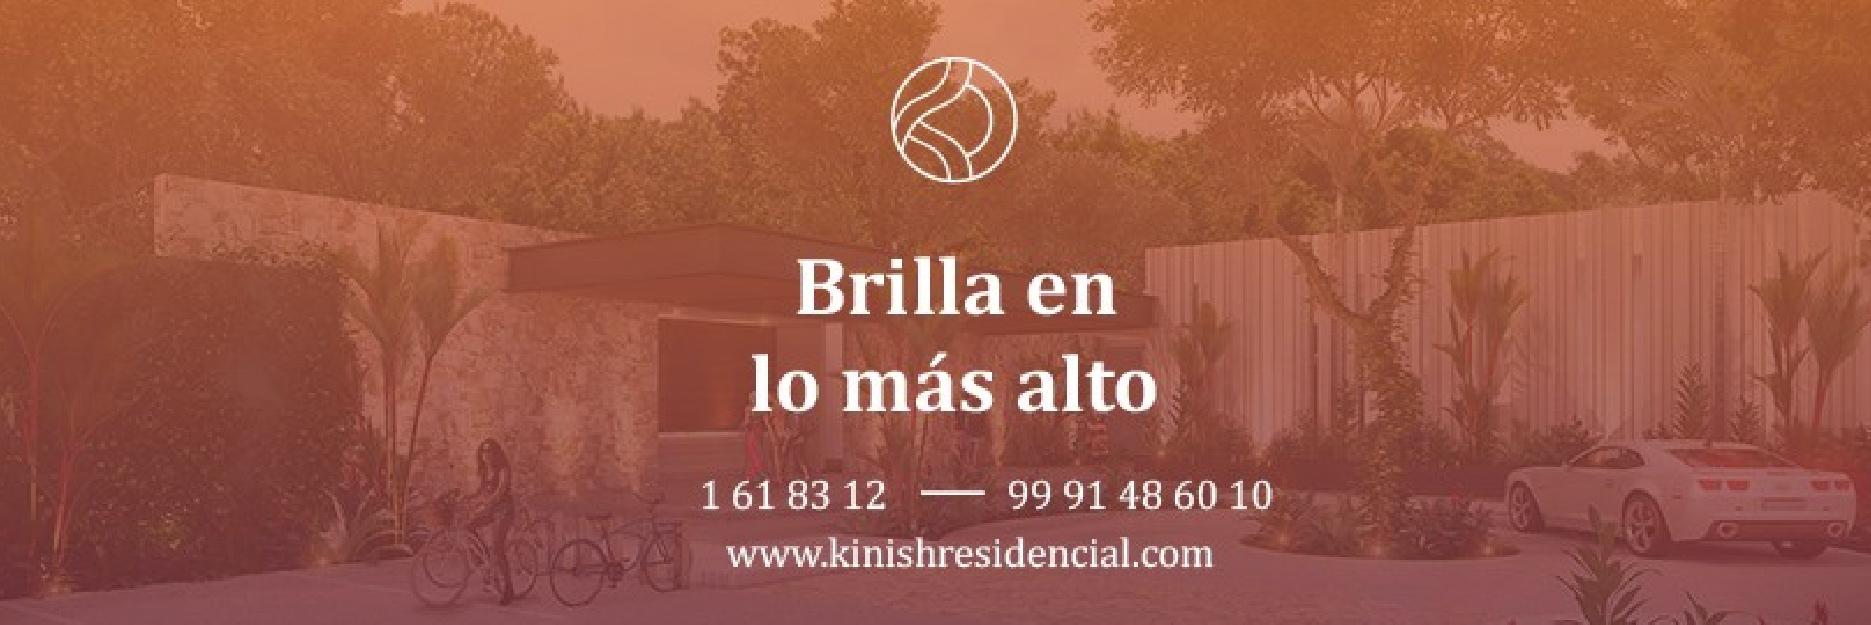 Terrenos Residenciales Venta Mérida KINISH Residencial Goodlers